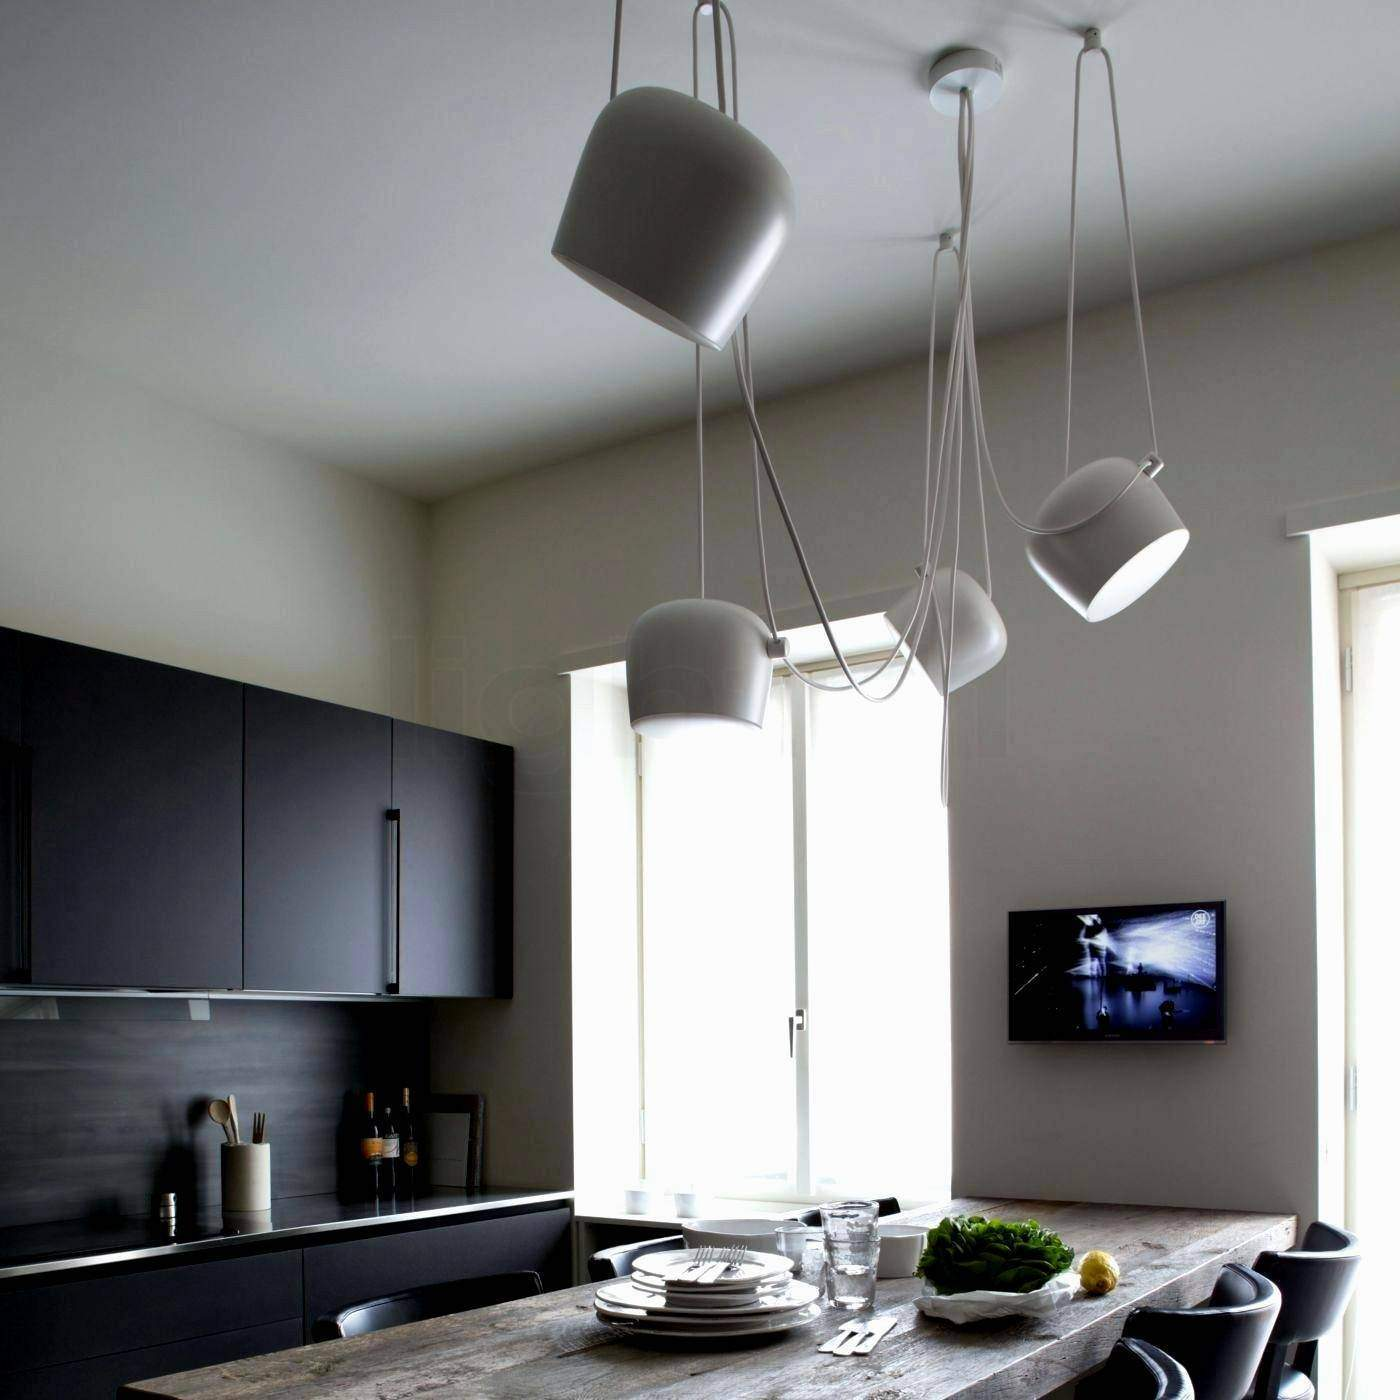 led lampen fur wohnzimmer frisch genial led lampen fur wohnzimmer of led lampen fur wohnzimmer